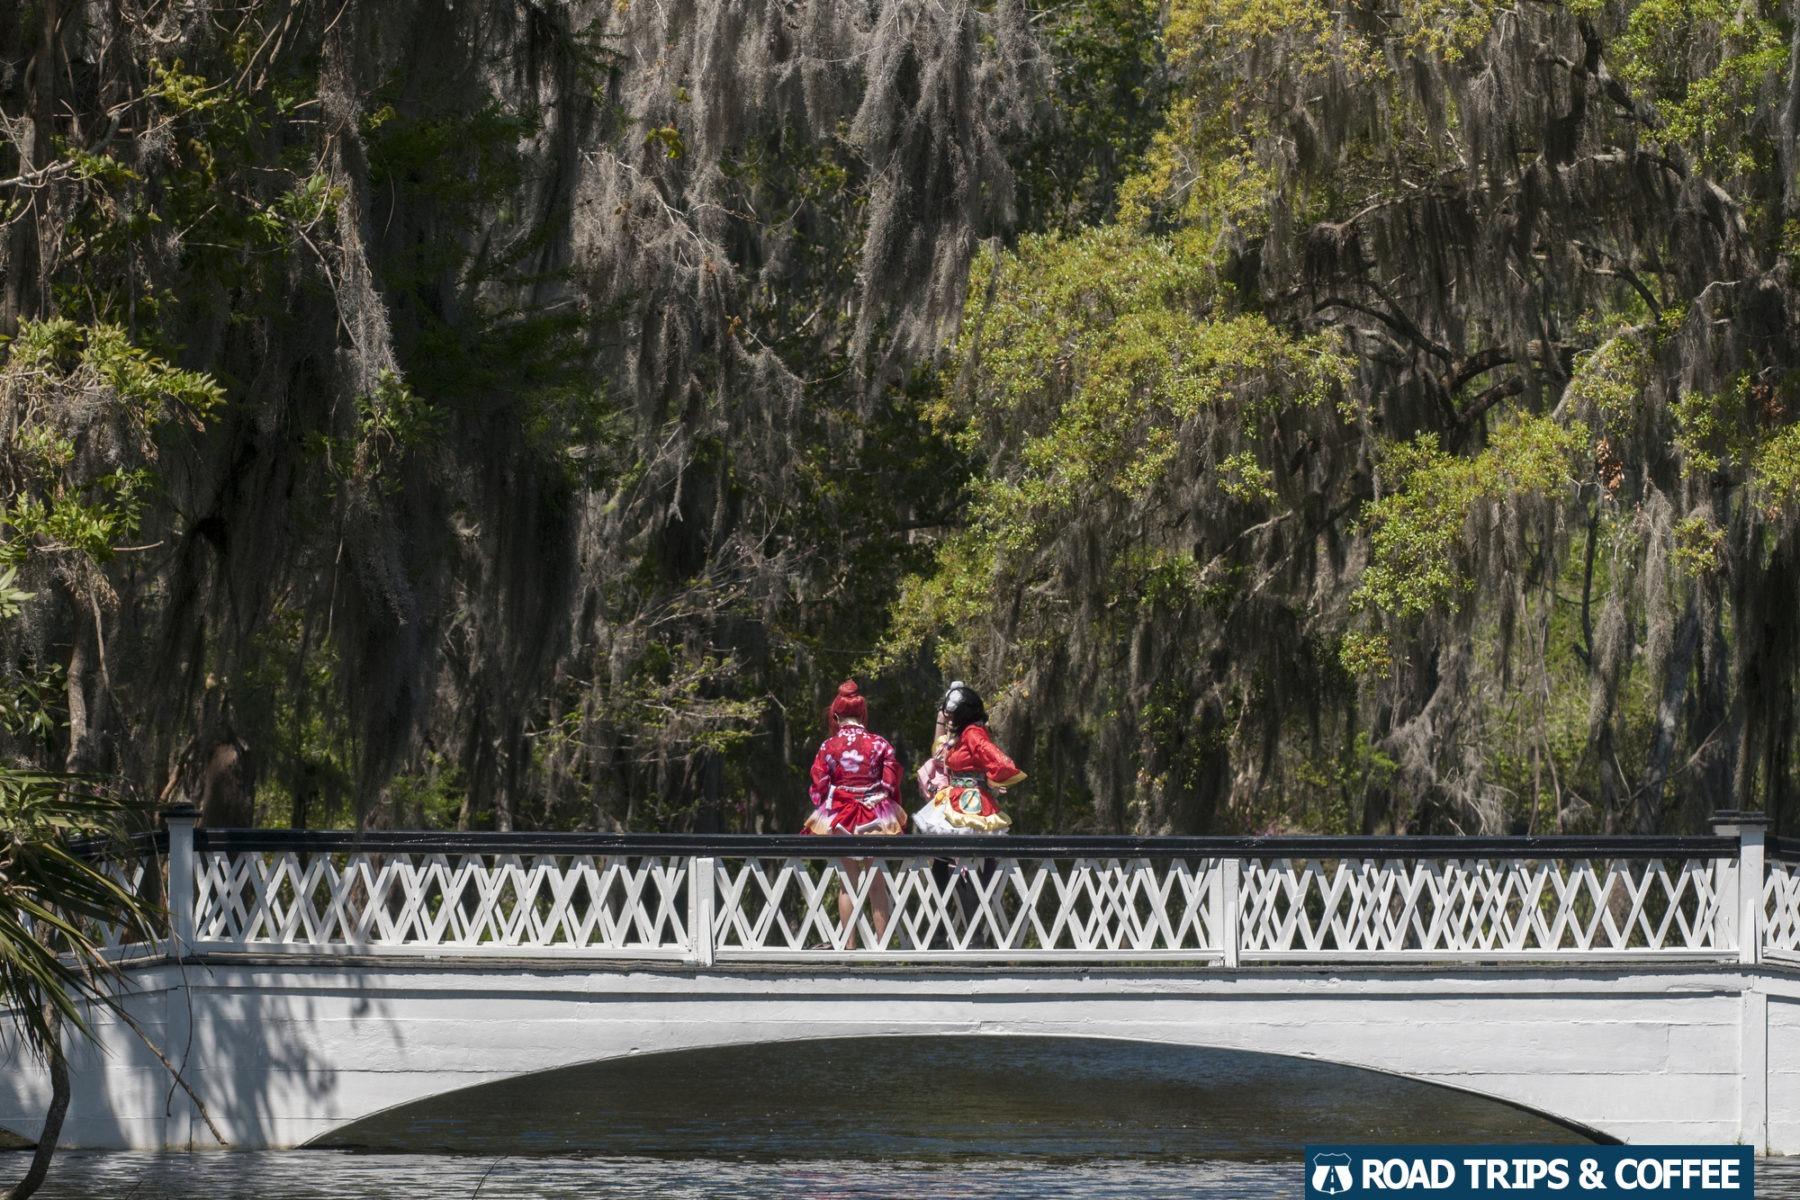 Two women dressed as 1800s women walk across a bridge at Magnolia Plantation and Garden in Charleston, South Carolina